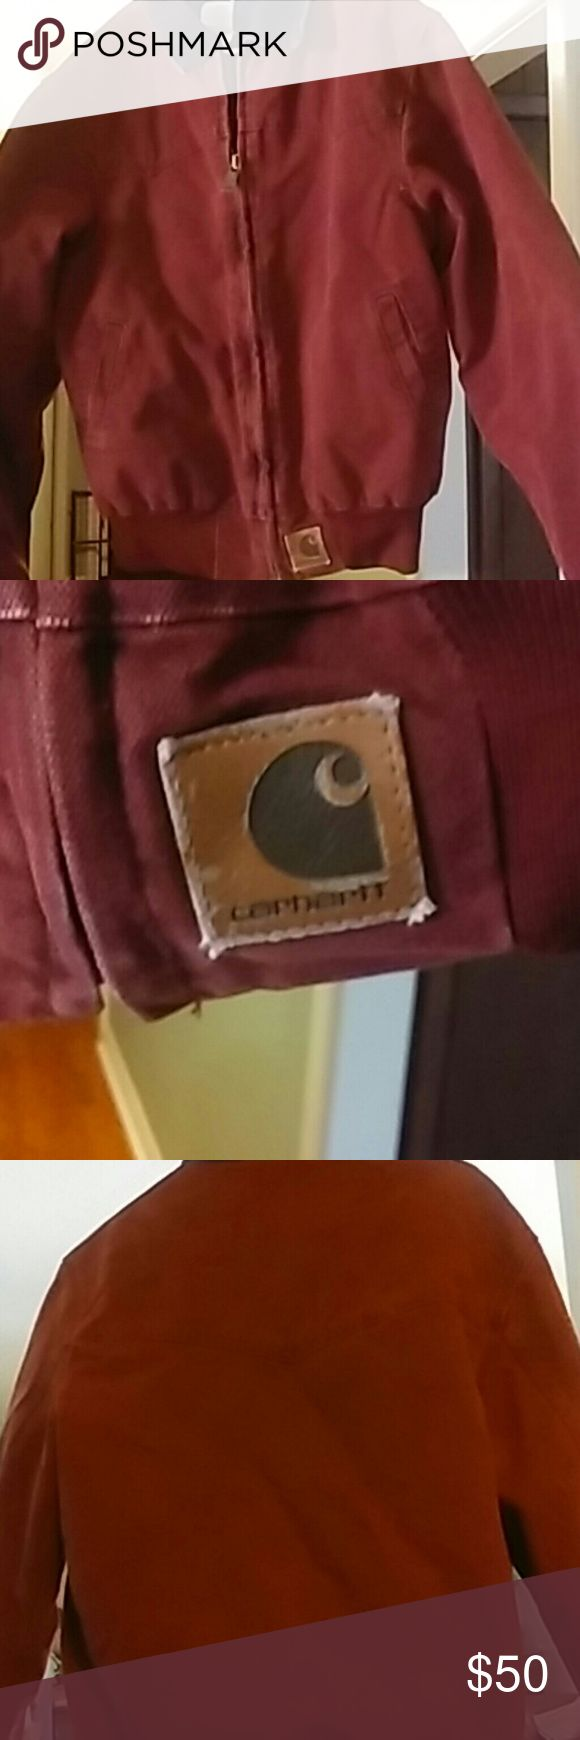 Men's Canvas Carhartt Coat Canvas rust colored coat. Two front pockets. Black collar. Zip up. Carhartt emblem on left bottom front Carhartt Jackets & Coats Lightweight & Shirt Jackets